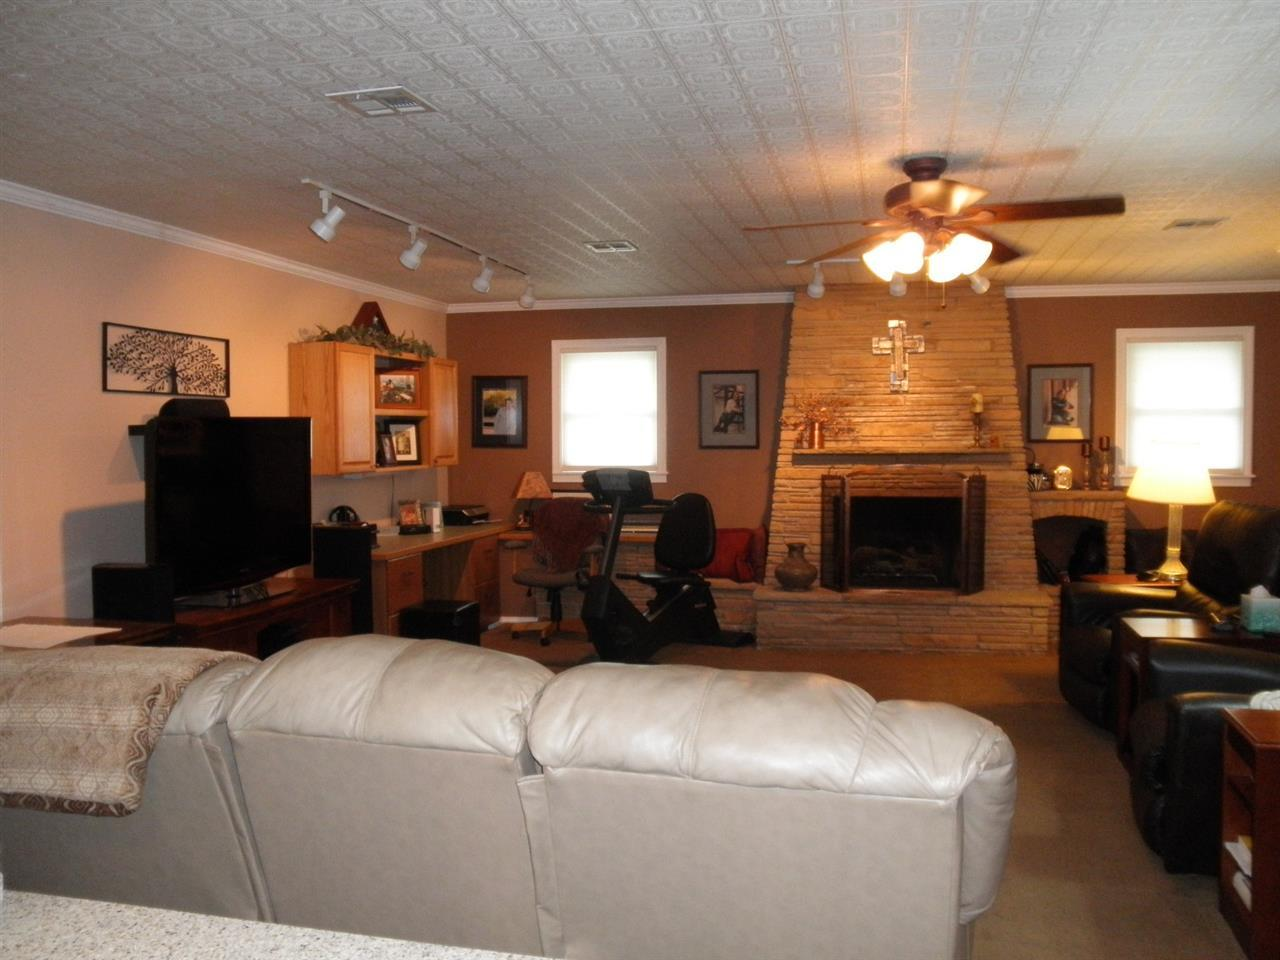 Sold Cross Sale W/ MLS | 127 Fairview  Ponca City, OK 74601 18